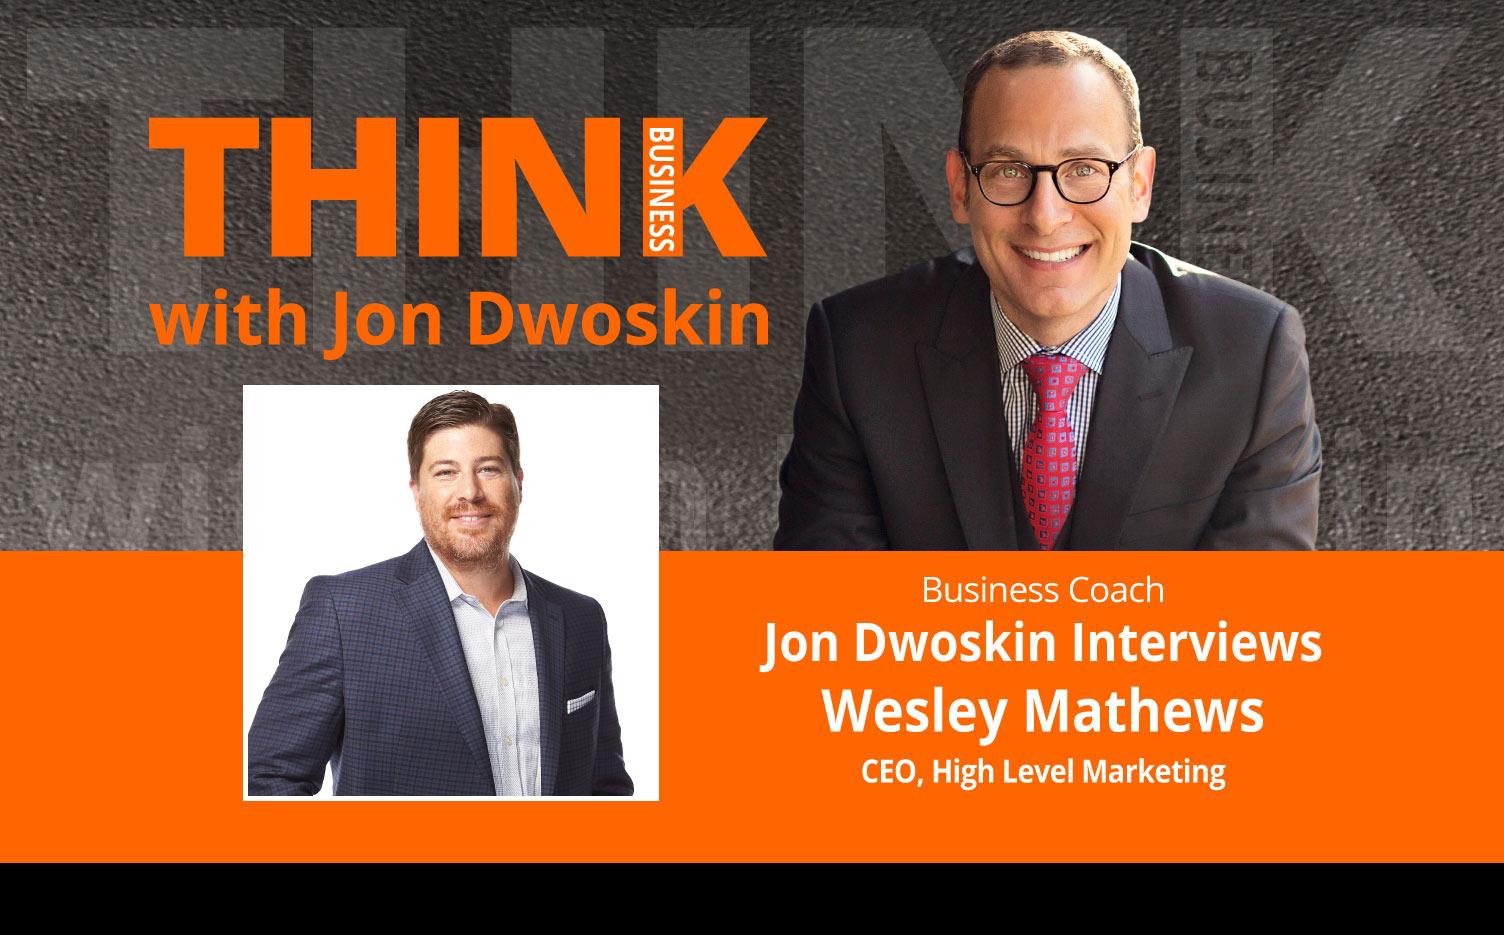 THINK Business Podcast: Jon Dwoskin Interviews Wesley Mathews, CEO, High Level Marketing